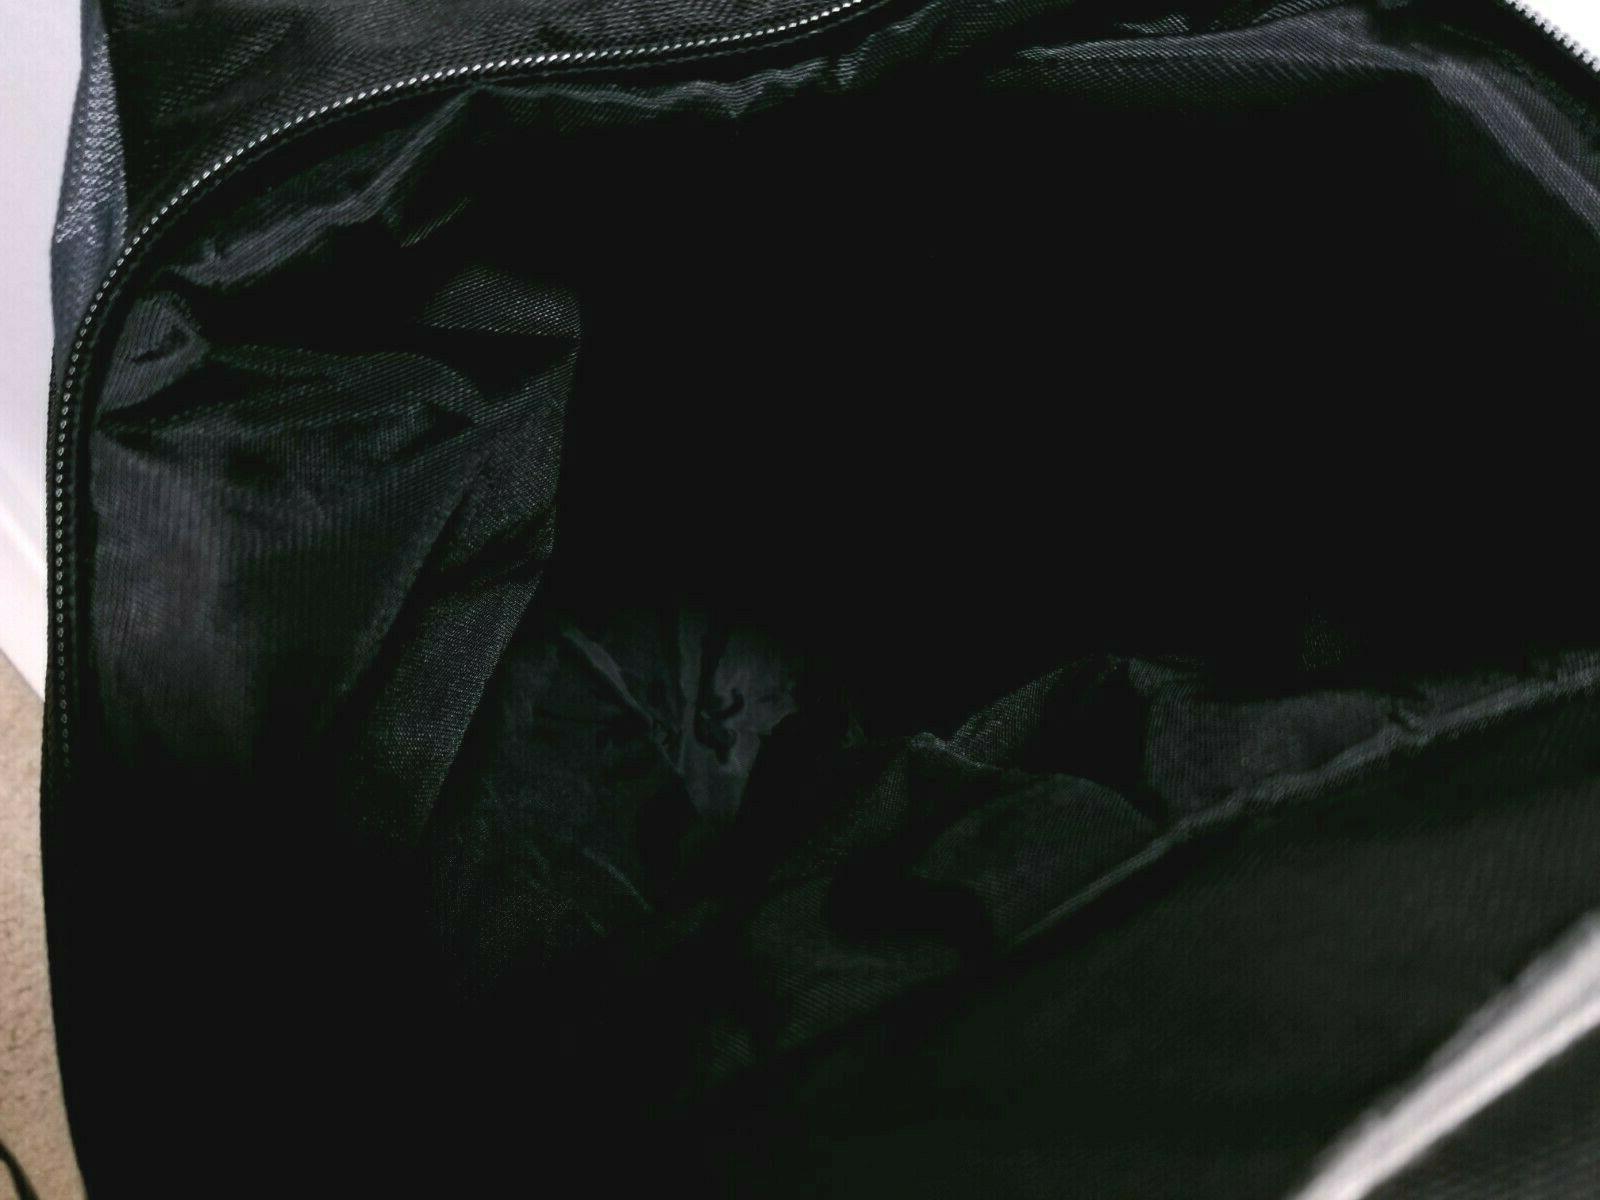 Nike Gym Duffle Bag Shoe Compartment